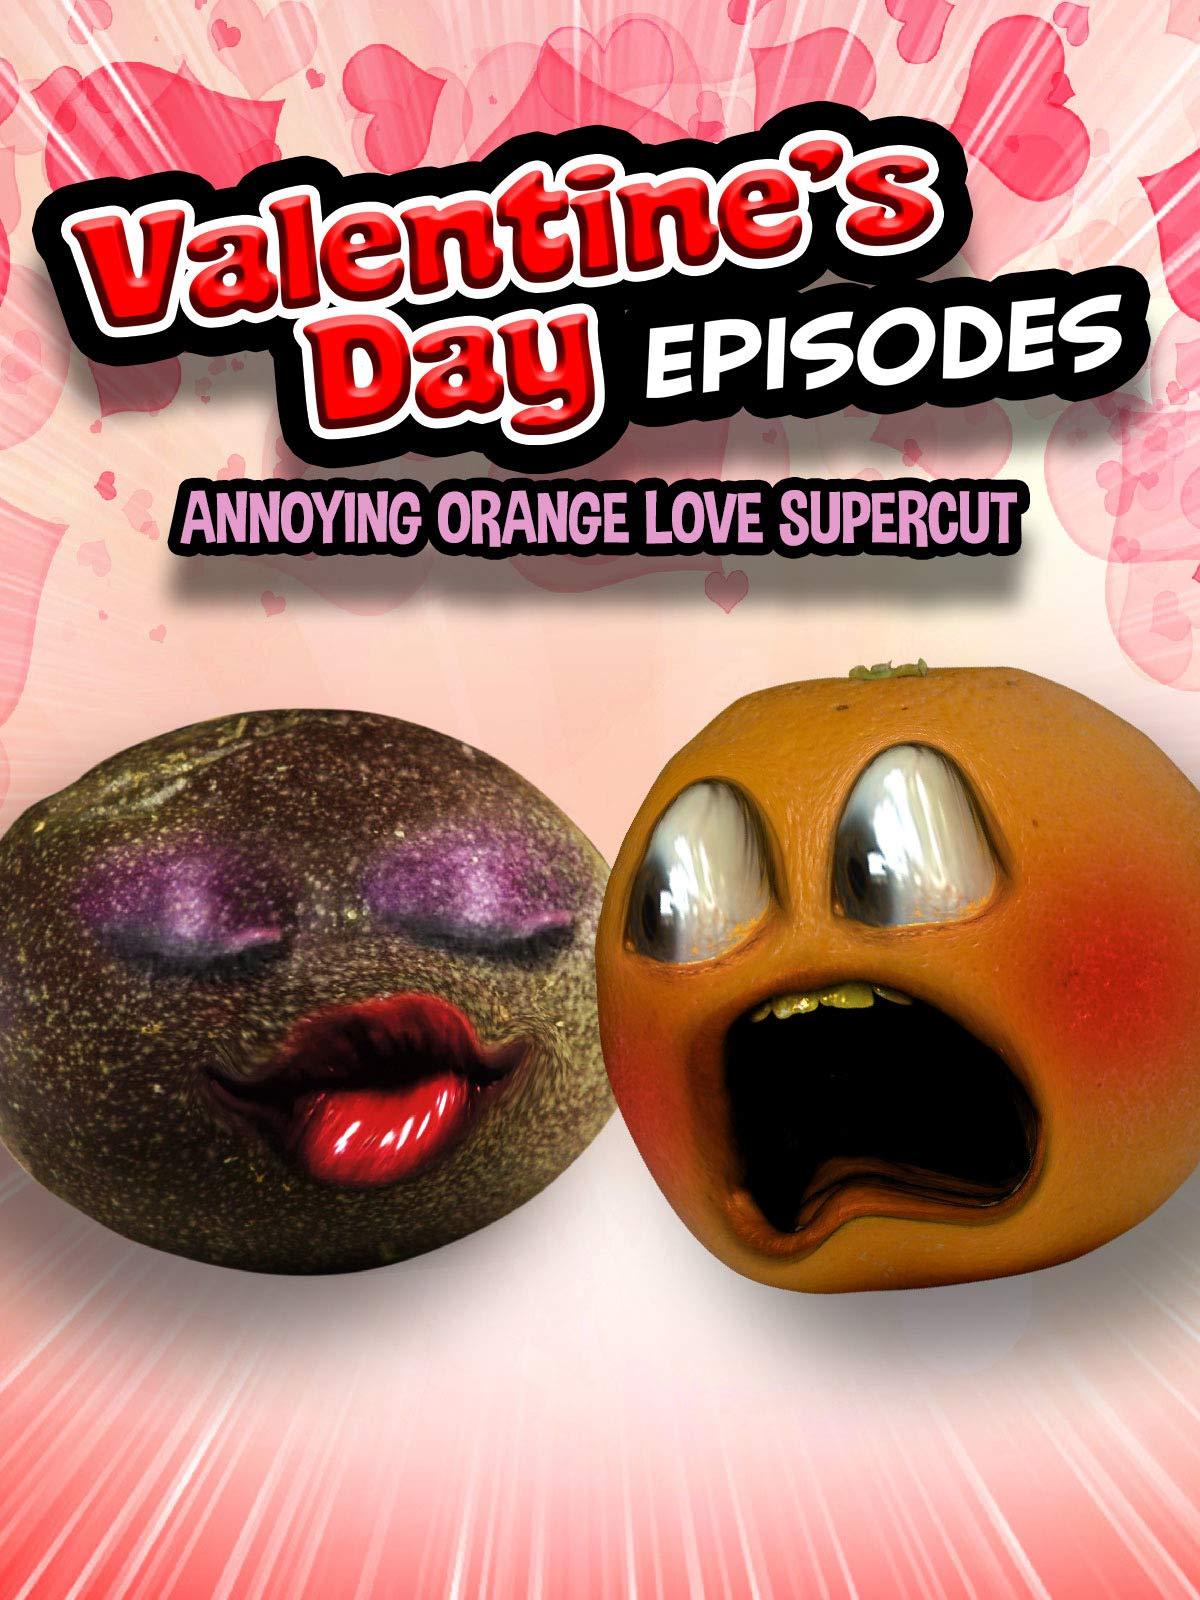 Annoying Orange Valentines Episodes (Annoying Orange Love Supercut)